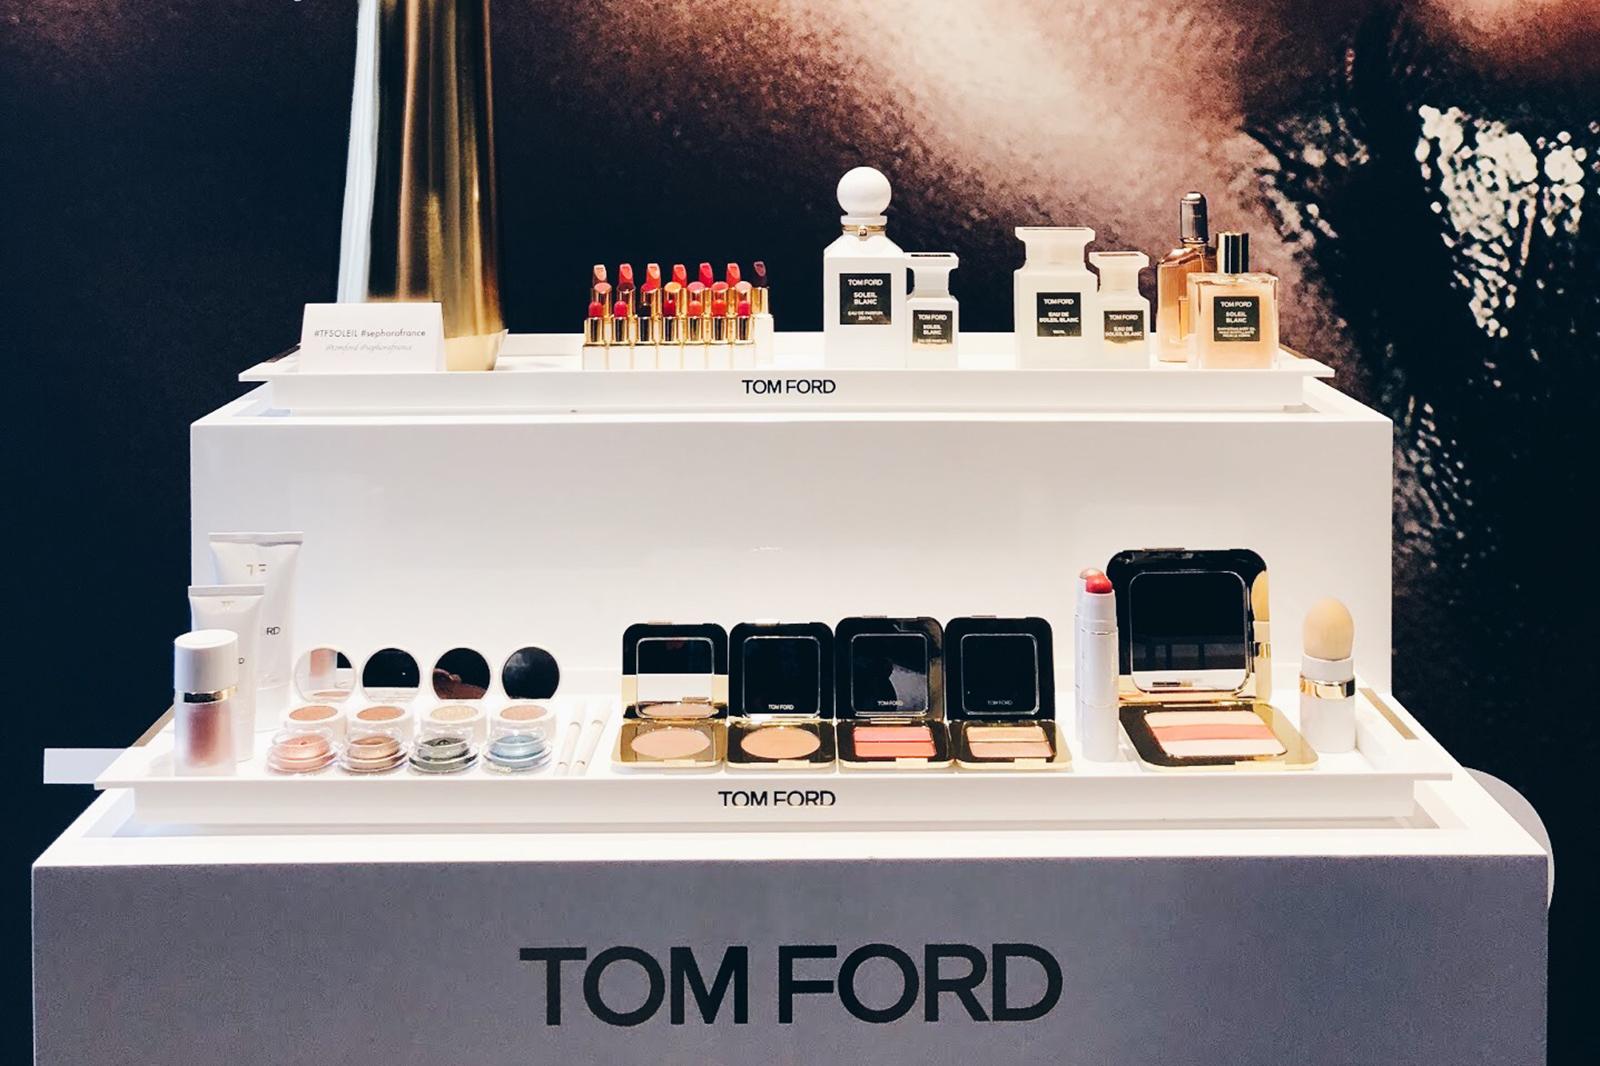 tom ford maquillage arrive chez sephora